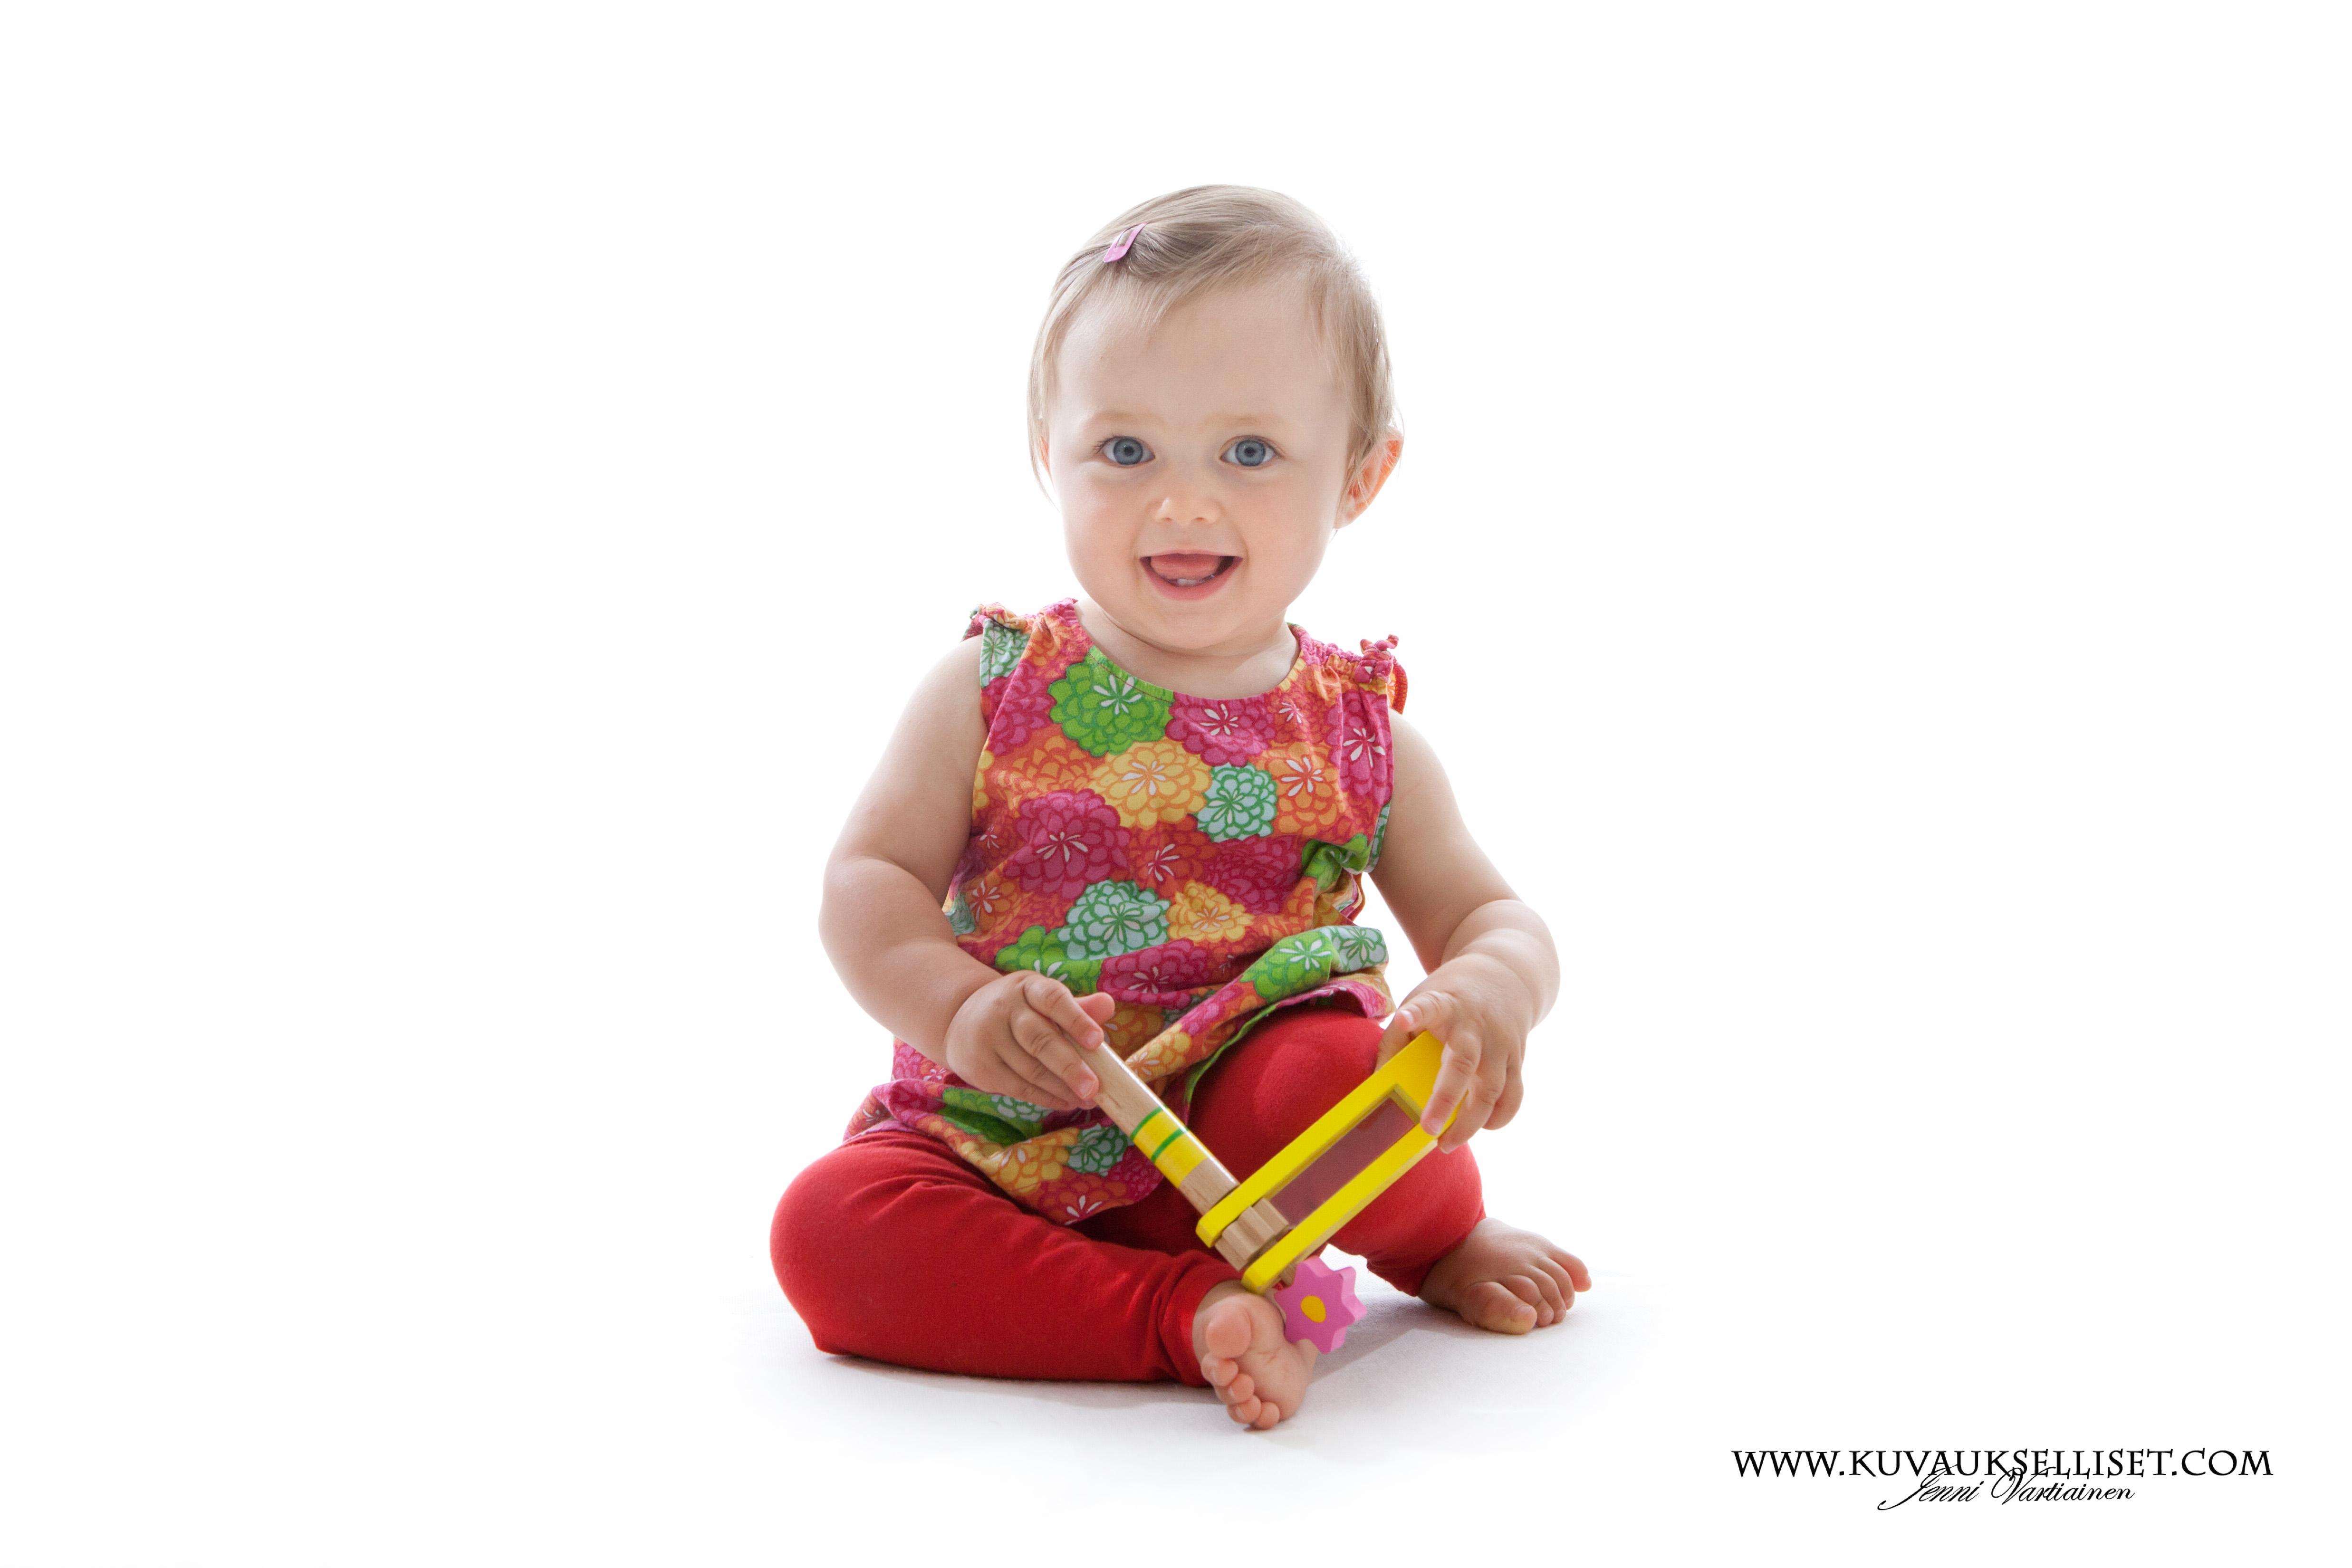 2014.8.13 lapsikuvaus miljöökuvaus perhekuvaus 1-vuotiskuvaus sisaruskuvaus family pictures child photo (3 of 5)